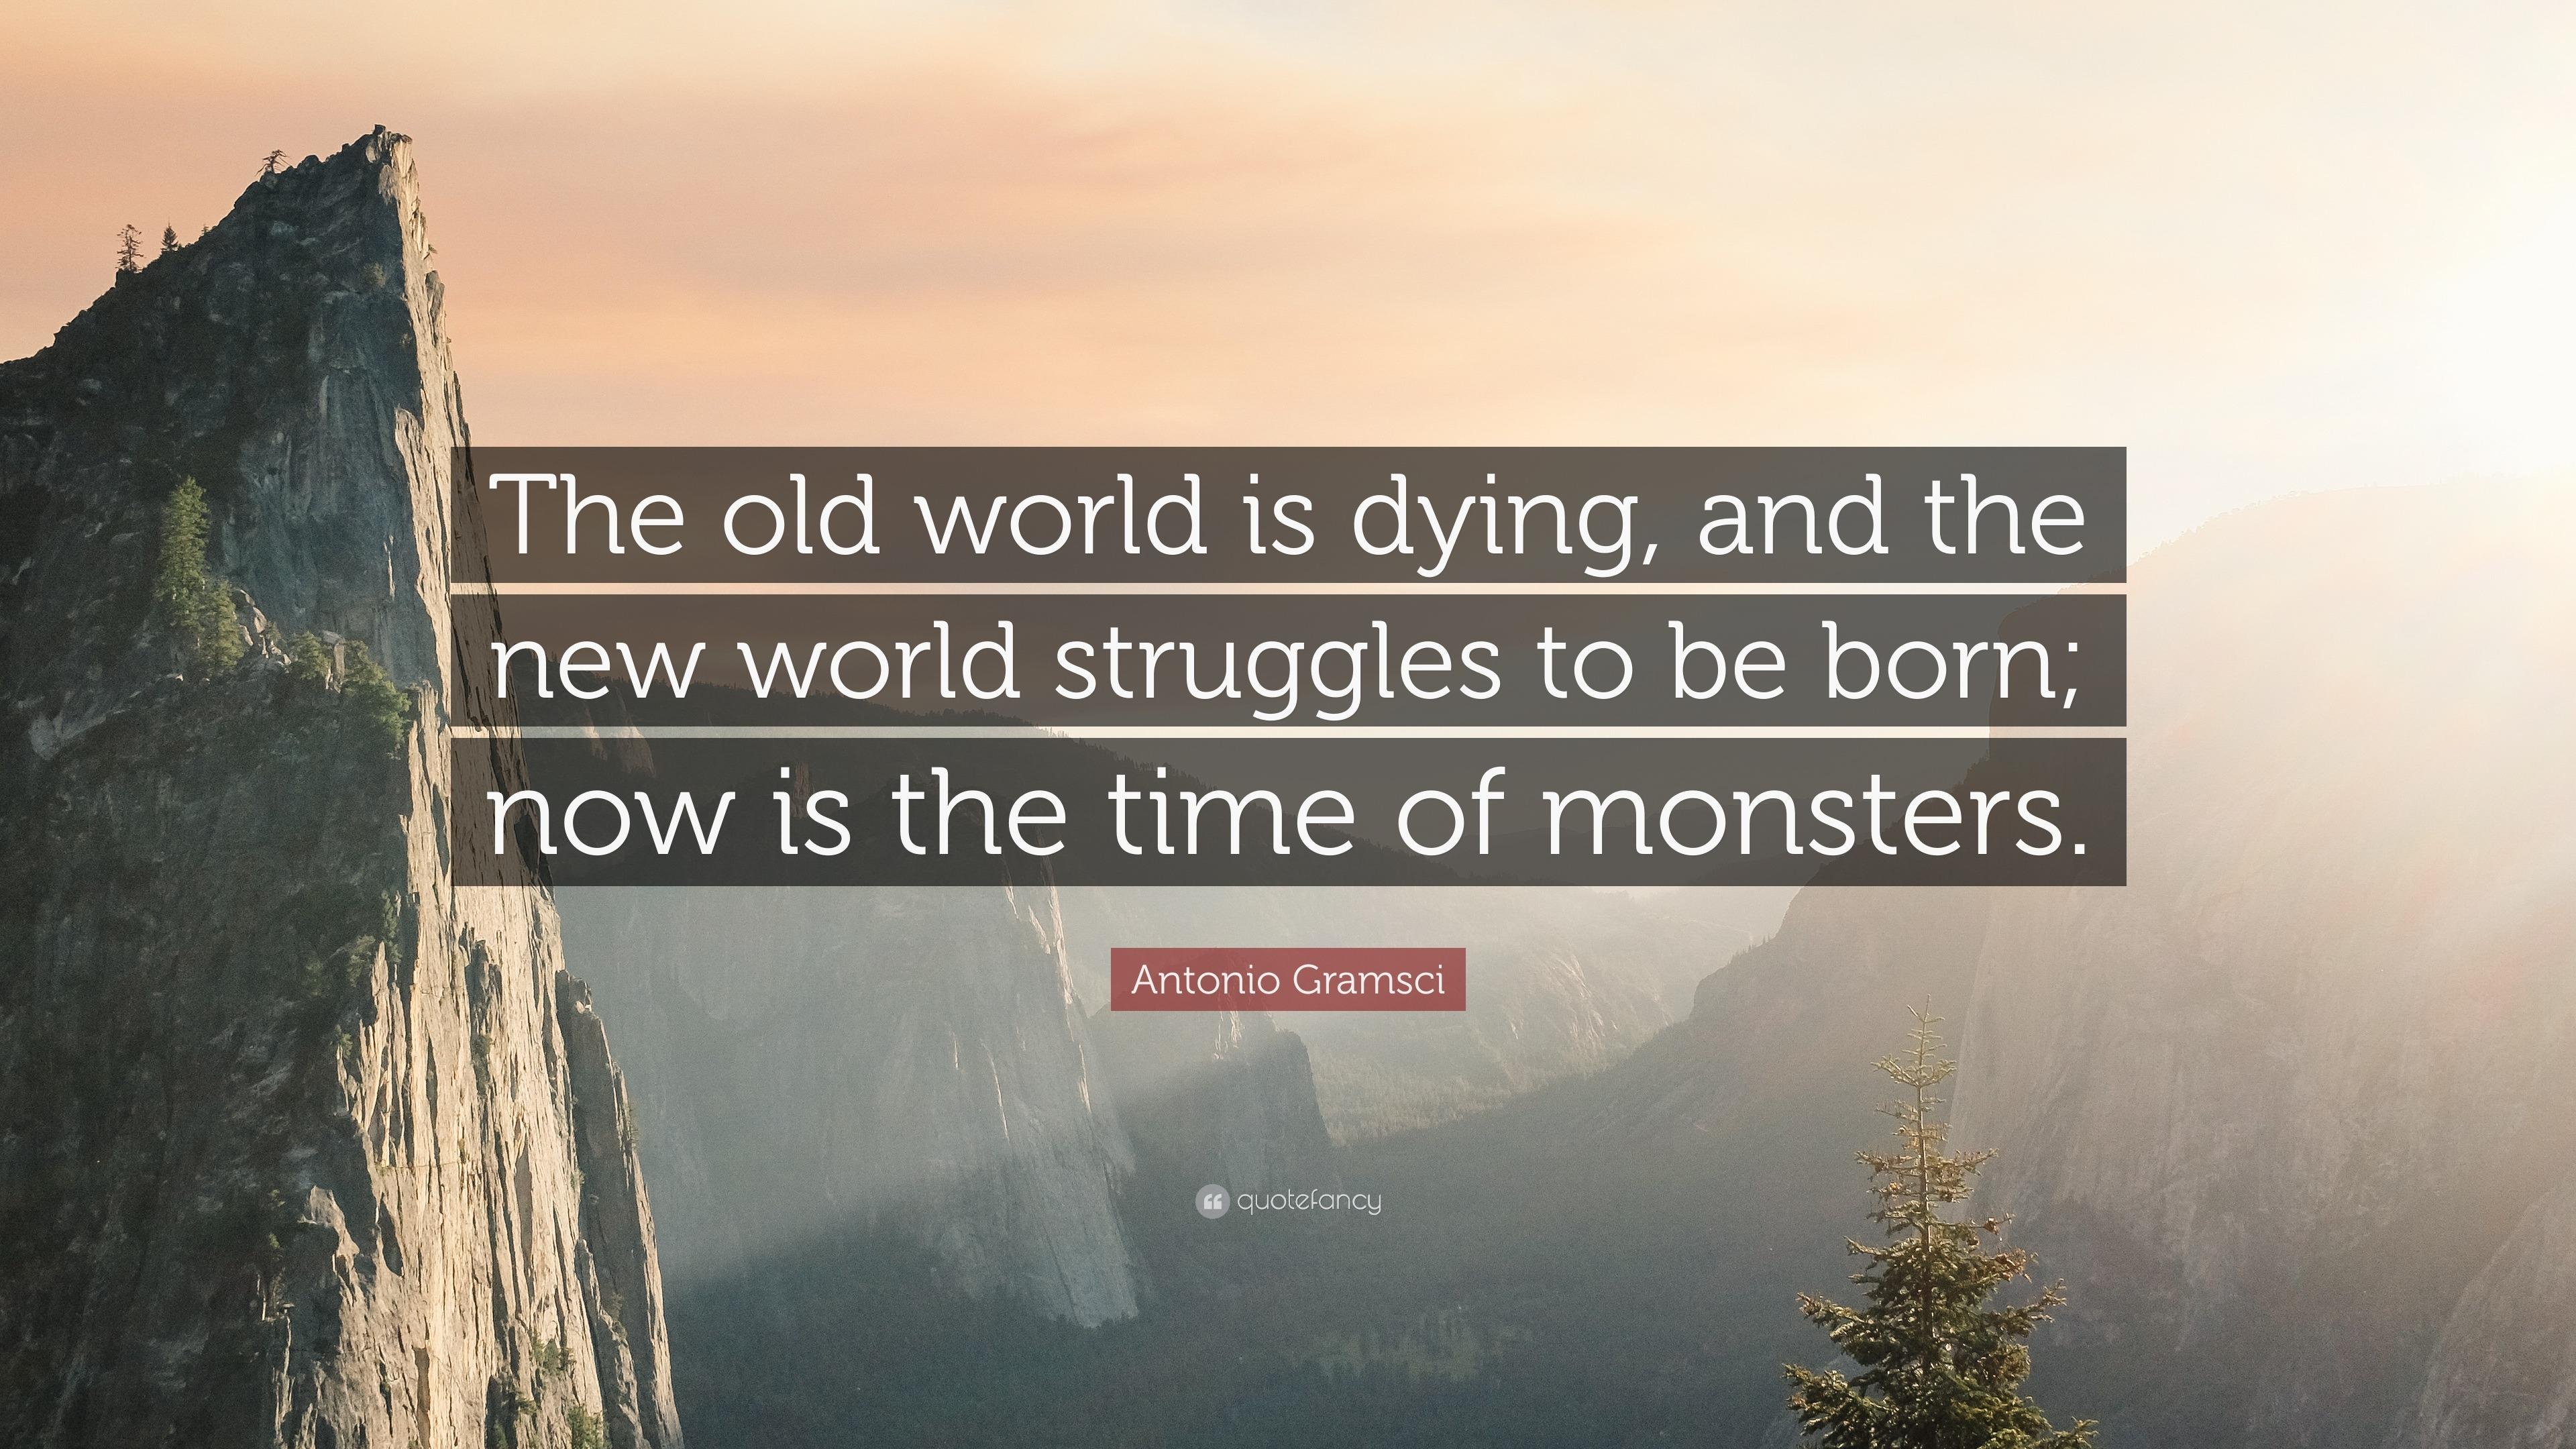 Steve Jobs Motivational Quotes Wallpaper Antonio Gramsci Quotes 23 Wallpapers Quotefancy